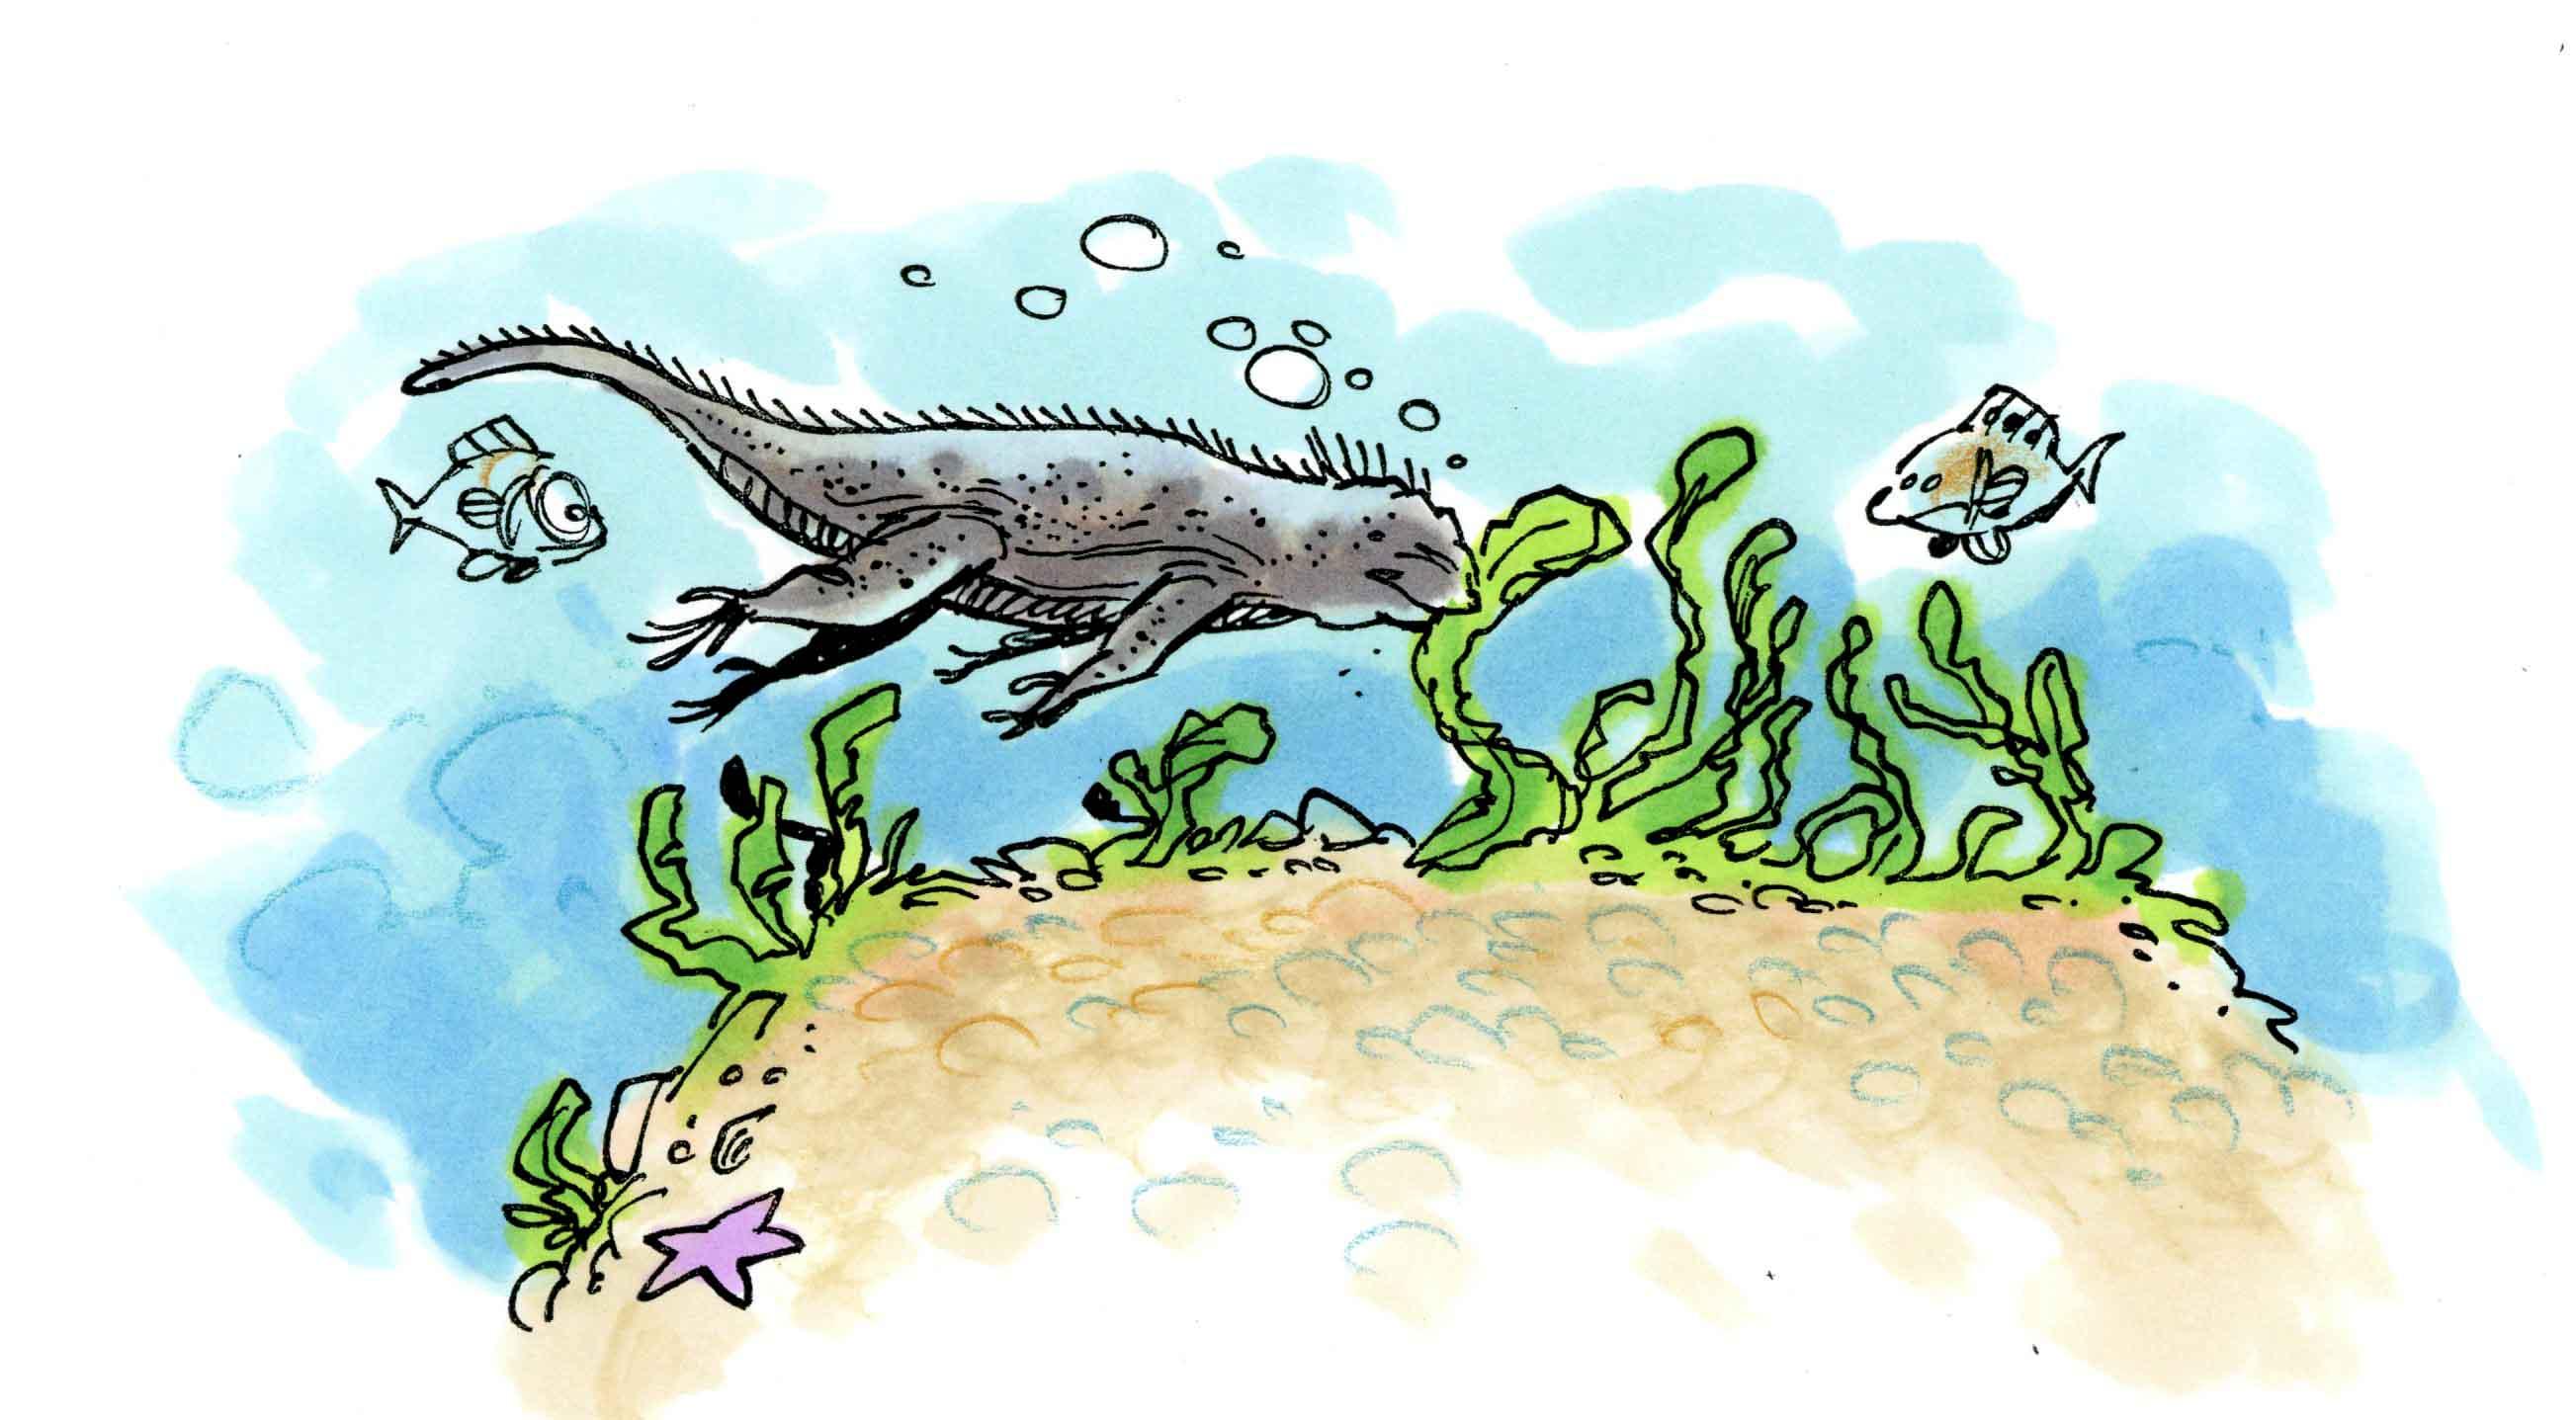 En plongée avec un iguane marin !